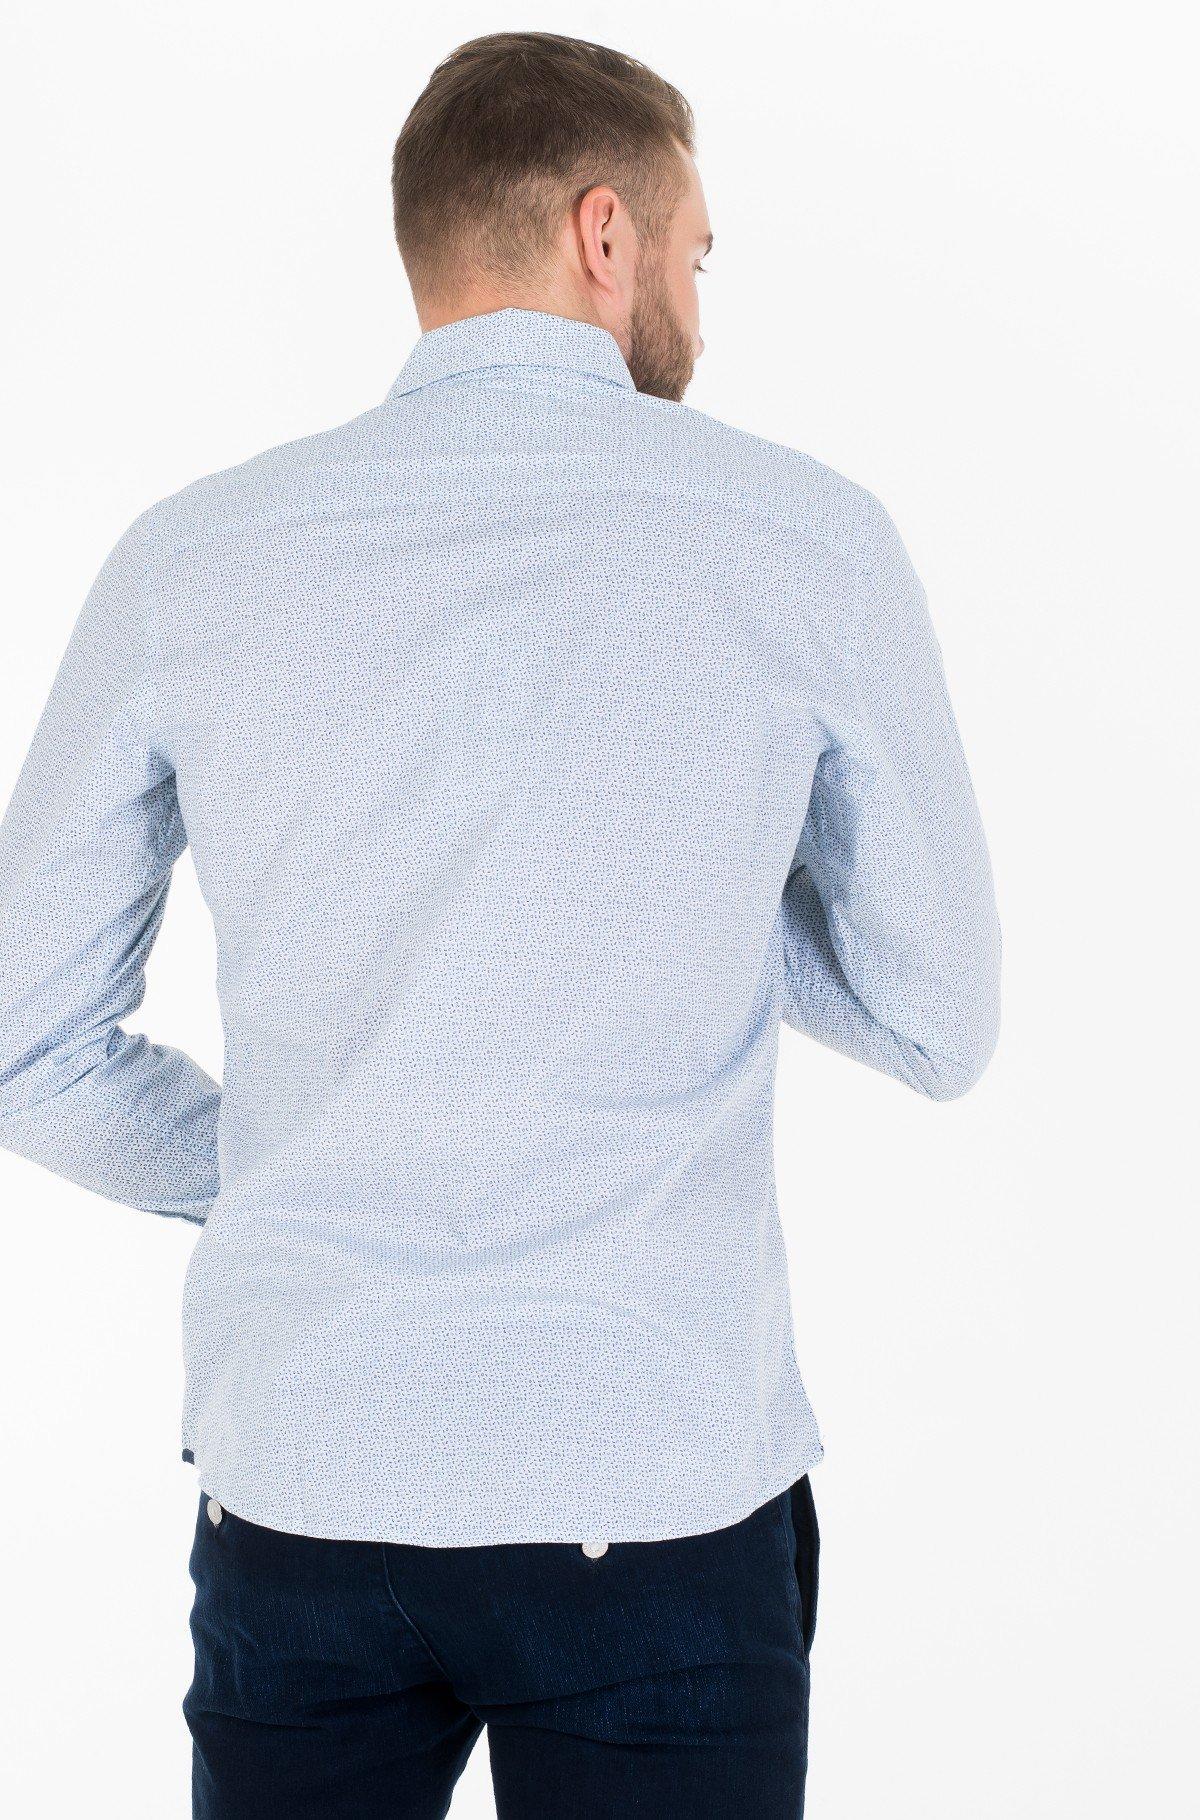 Marškiniai MENO 1100-full-3